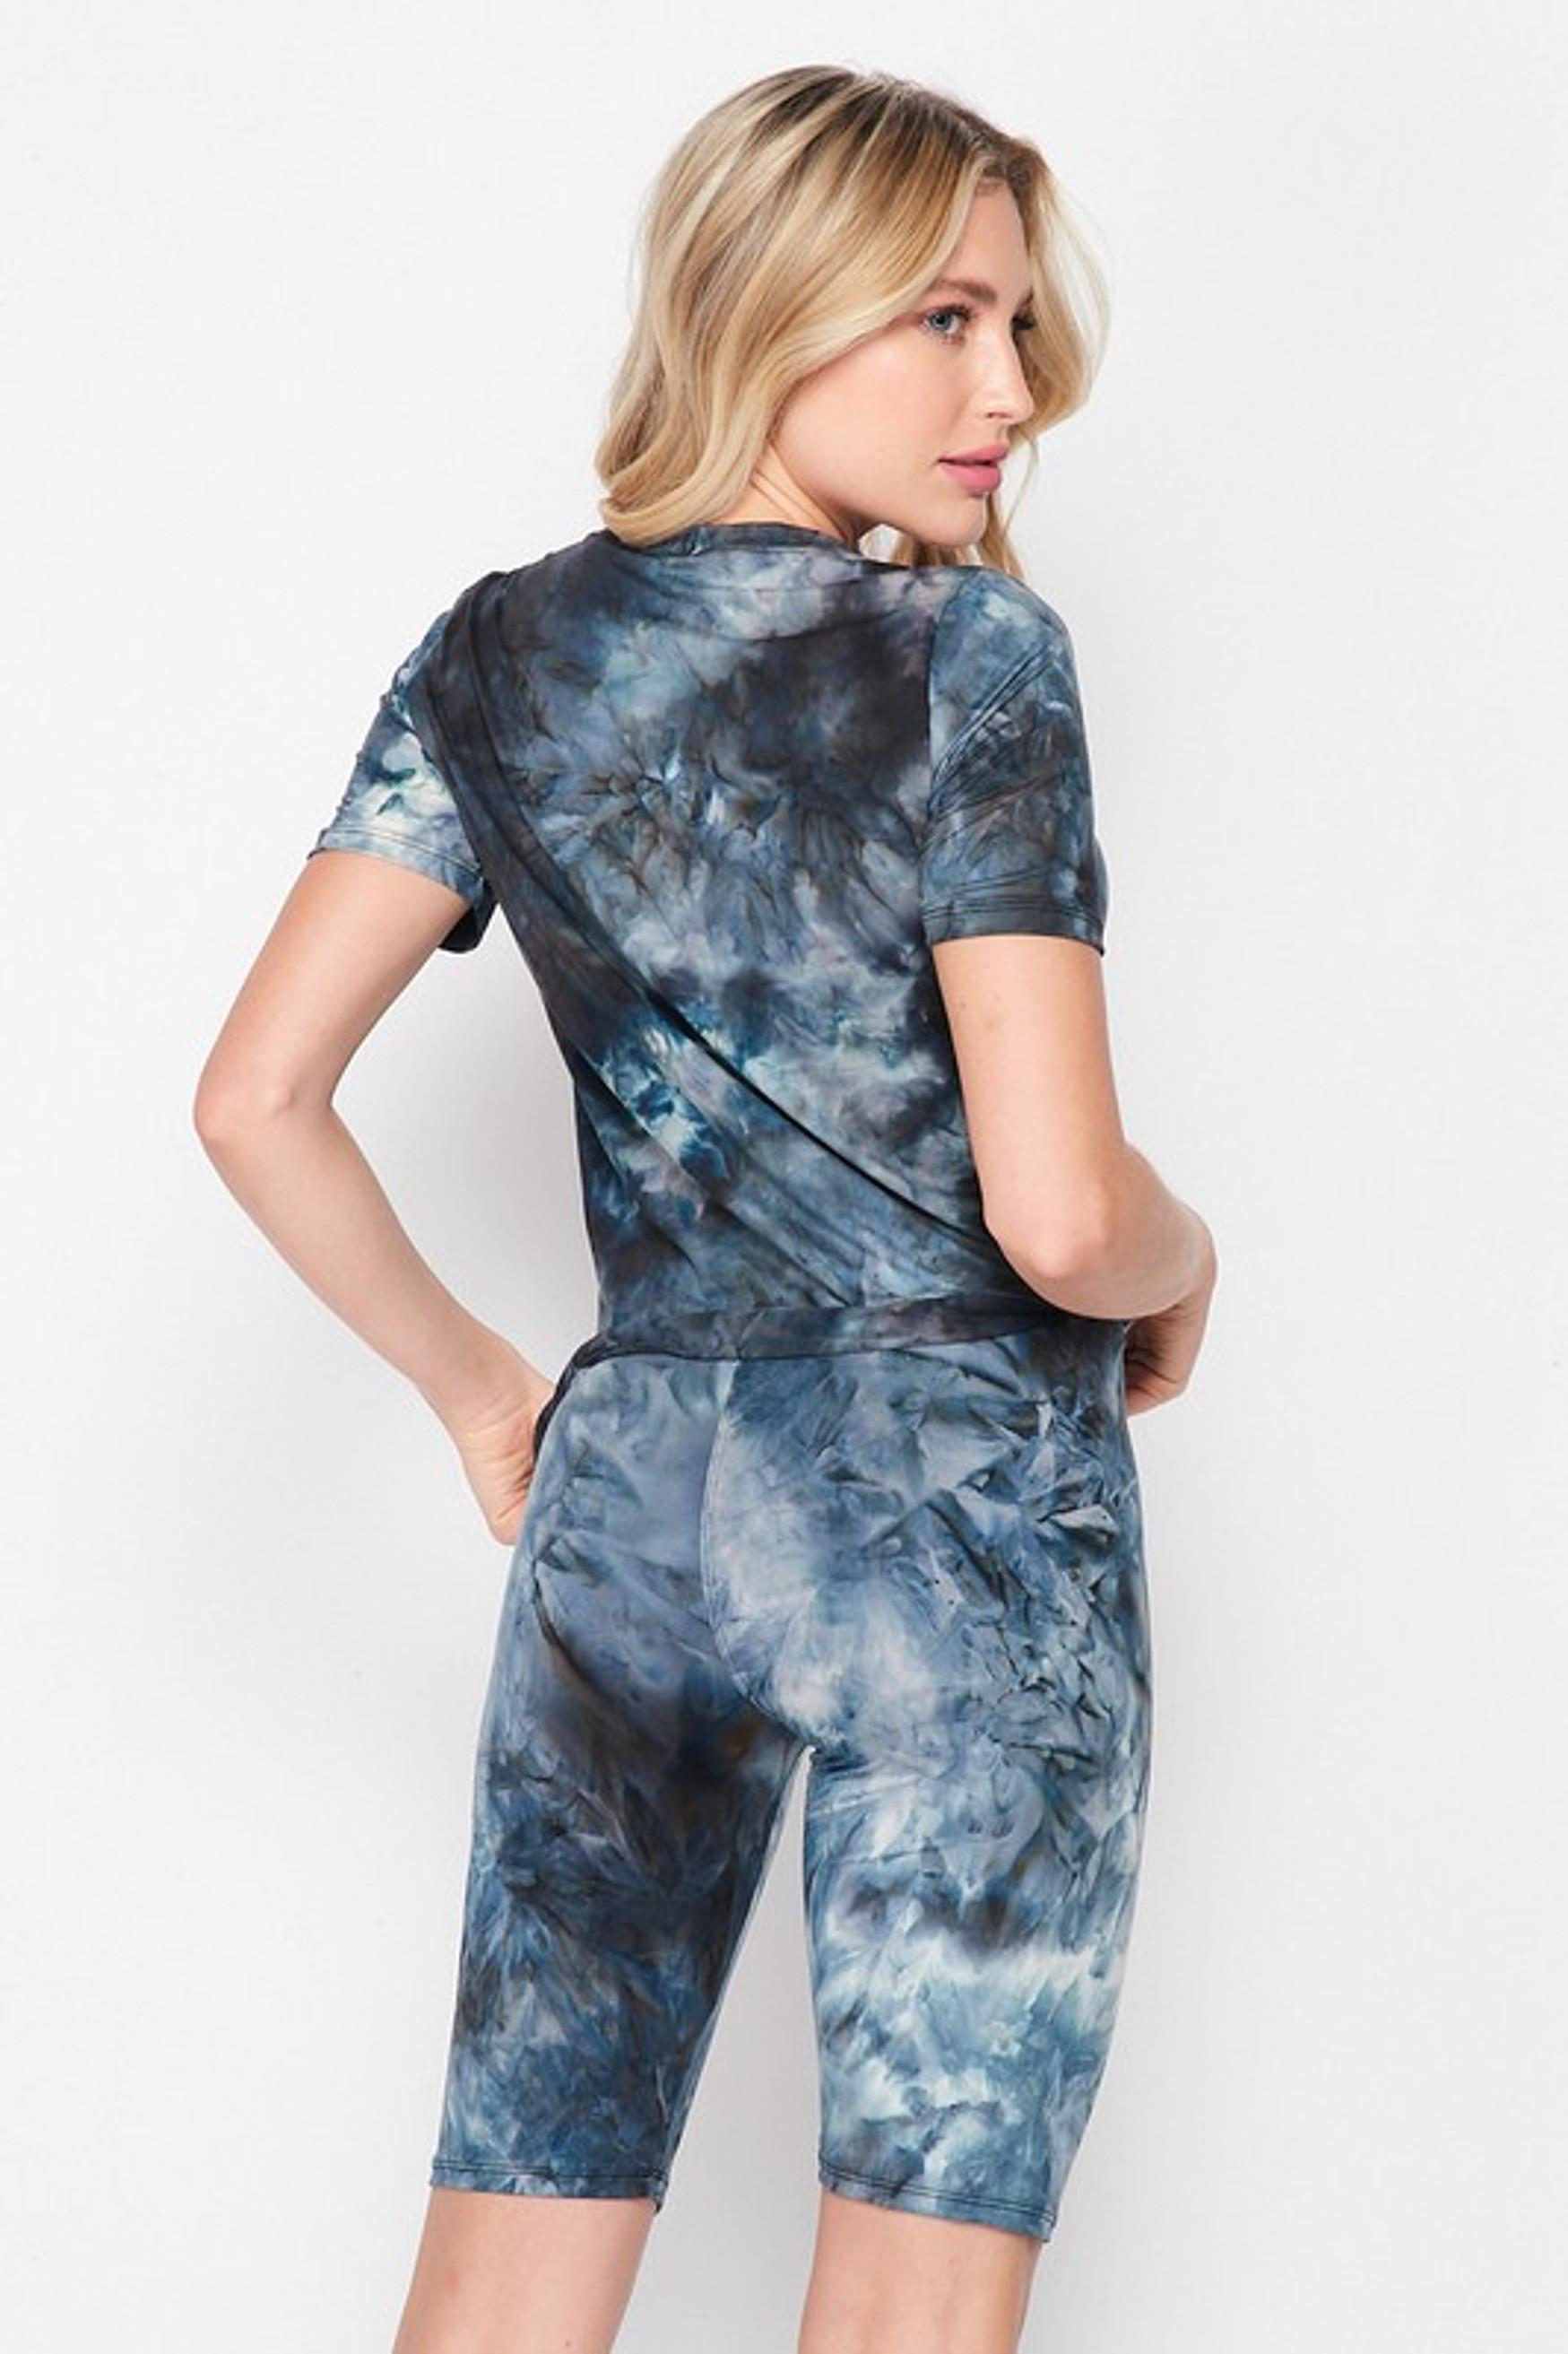 2 Piece Buttery Soft Navy Tie Dye Biker Shorts and T-Shirt Set - Plus Size